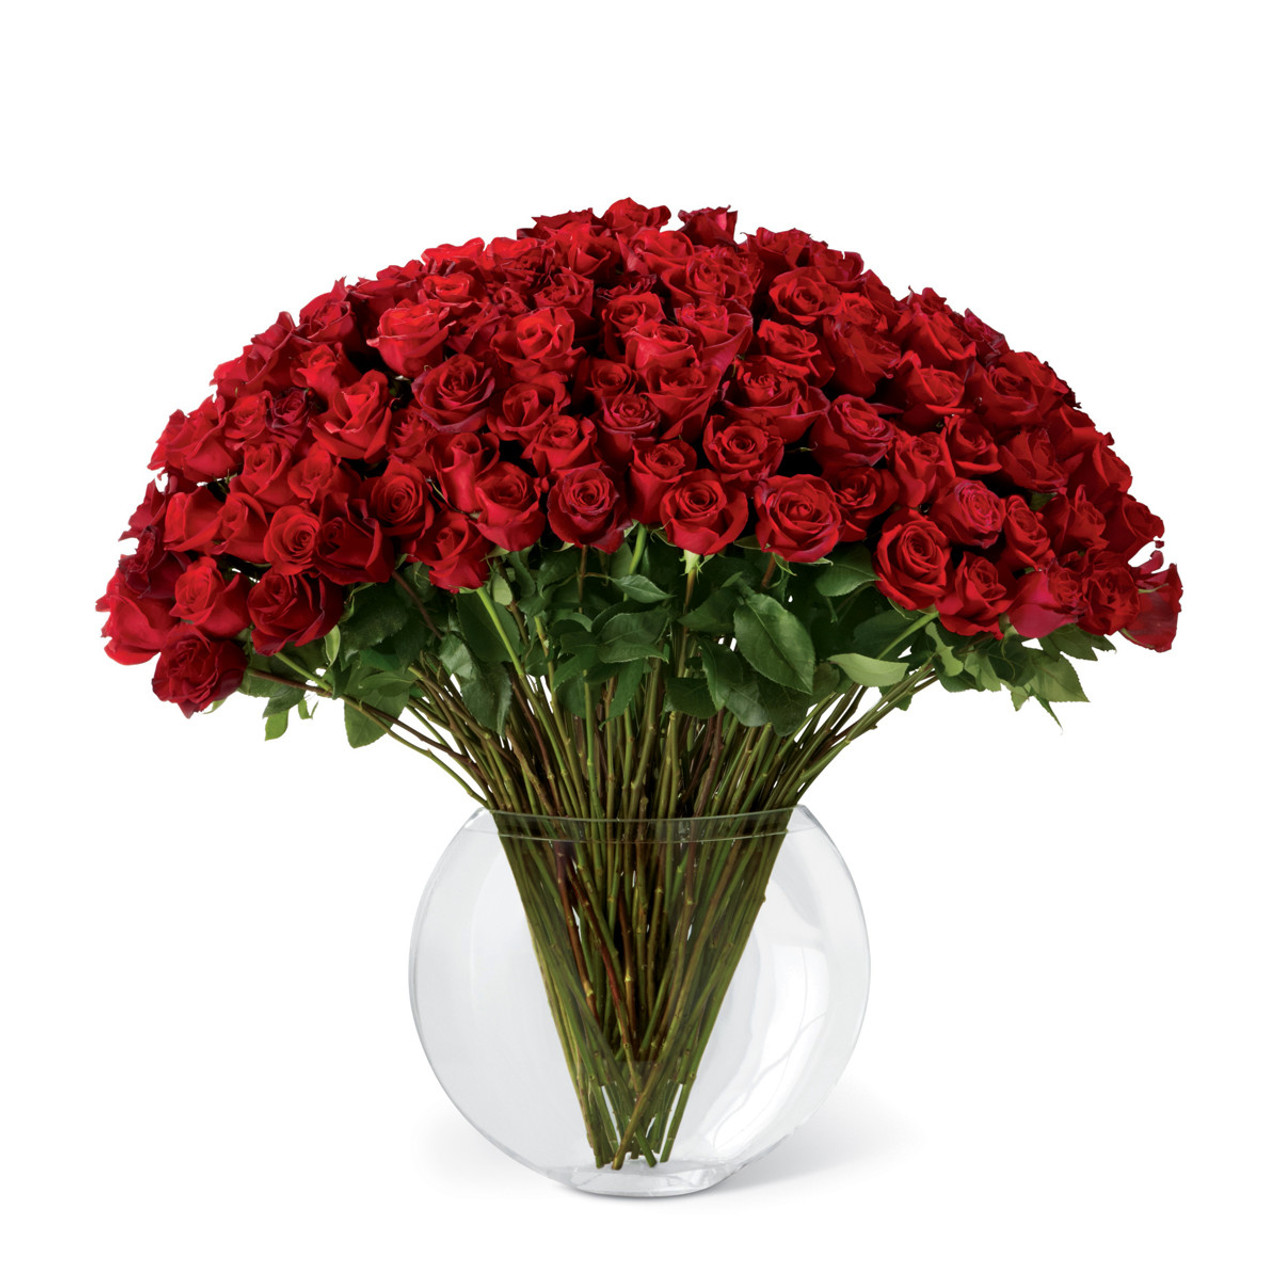 Thebreathless luxury bouquet breathless luxury bouquet izmirmasajfo Choice Image